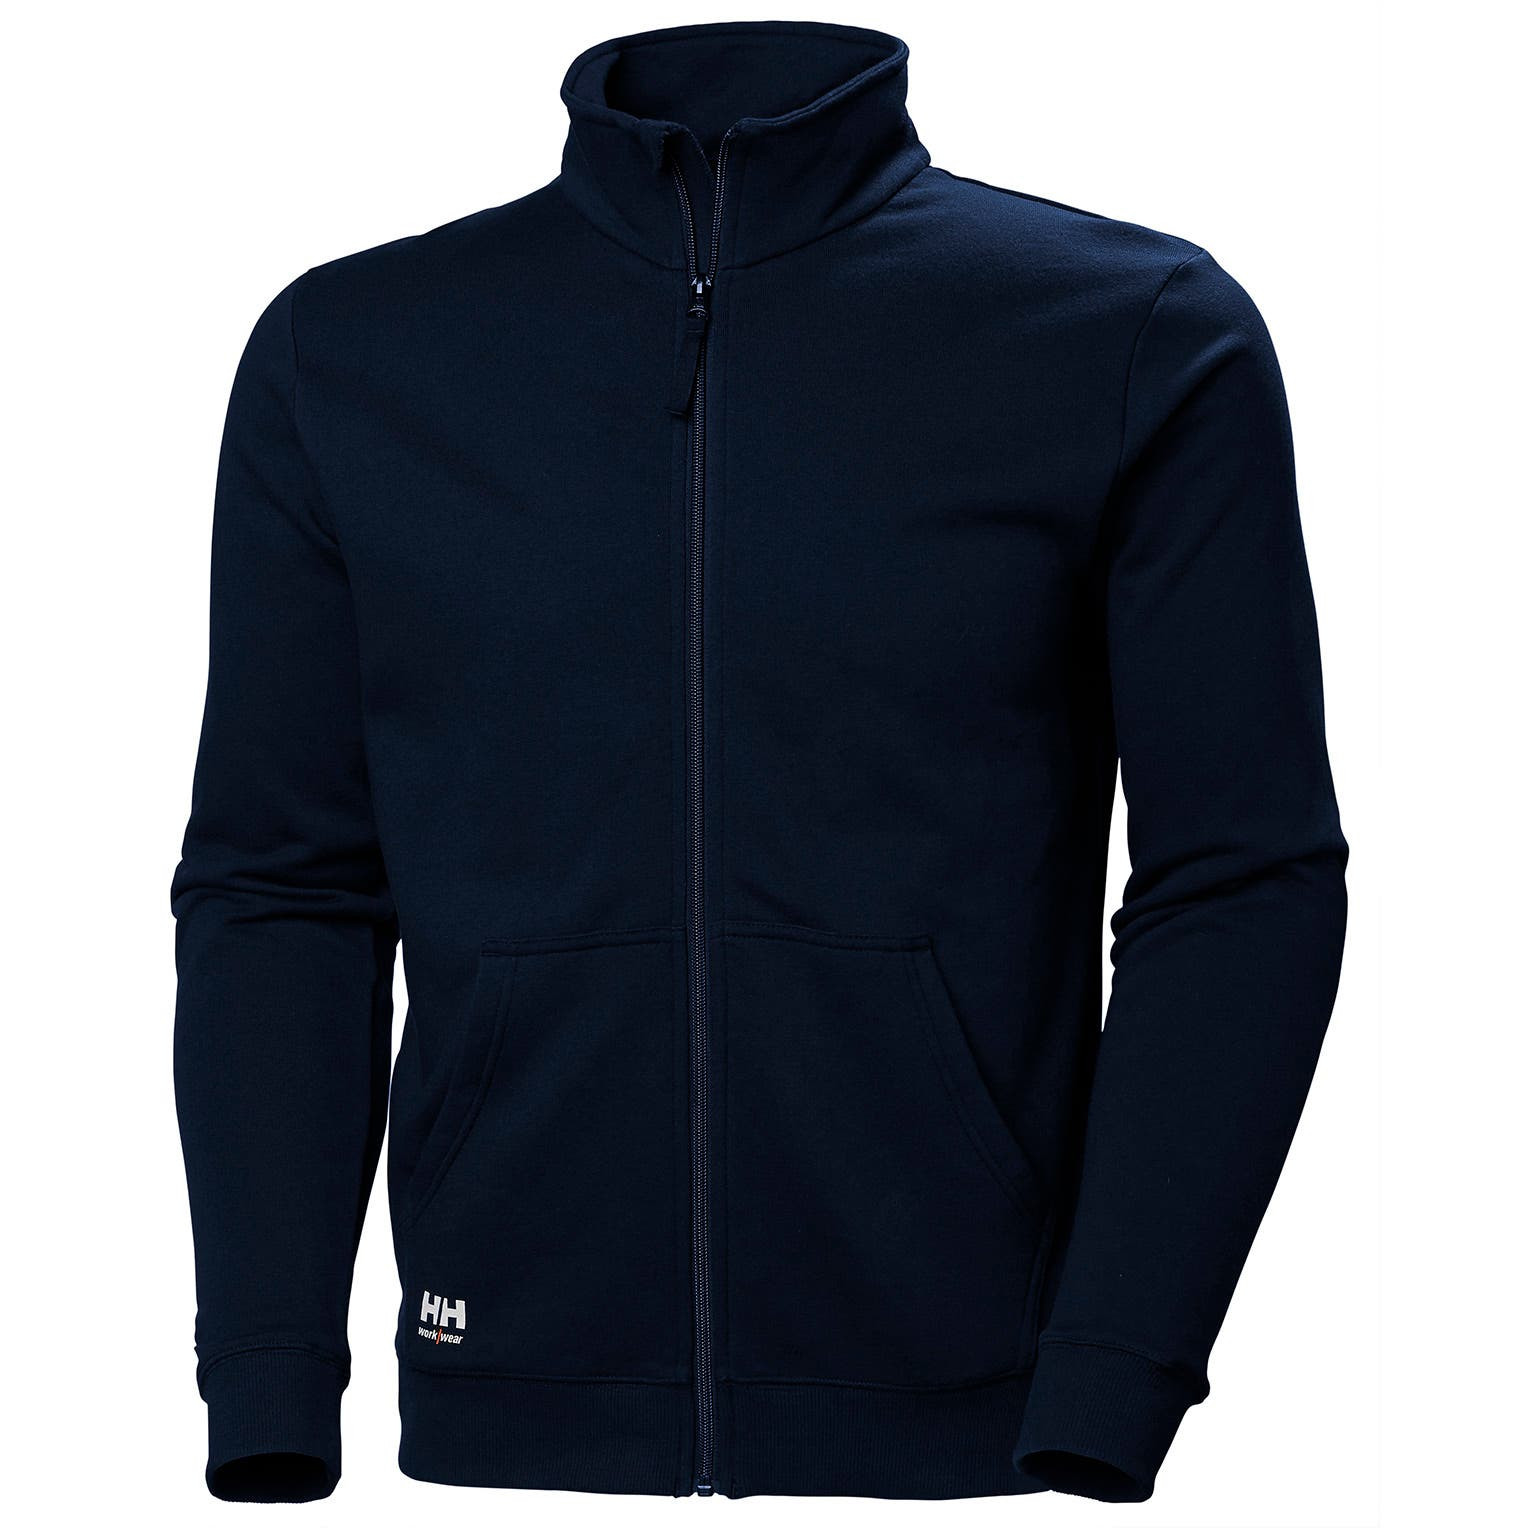 Свитшот на молнии Helly Hansen Manchester Zip Sweatshirt - 79212 (Navy; XL)